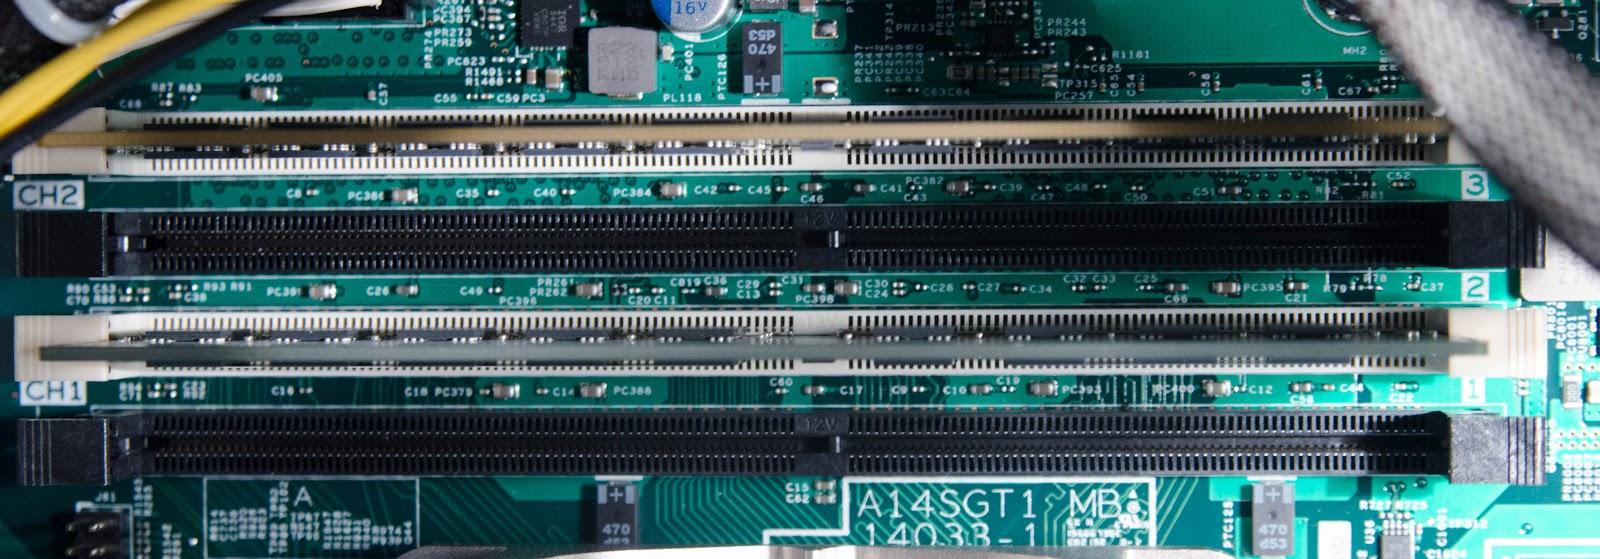 MаL, да удал: Обзор младших серверов линейки HPE ProLiant ML - 13